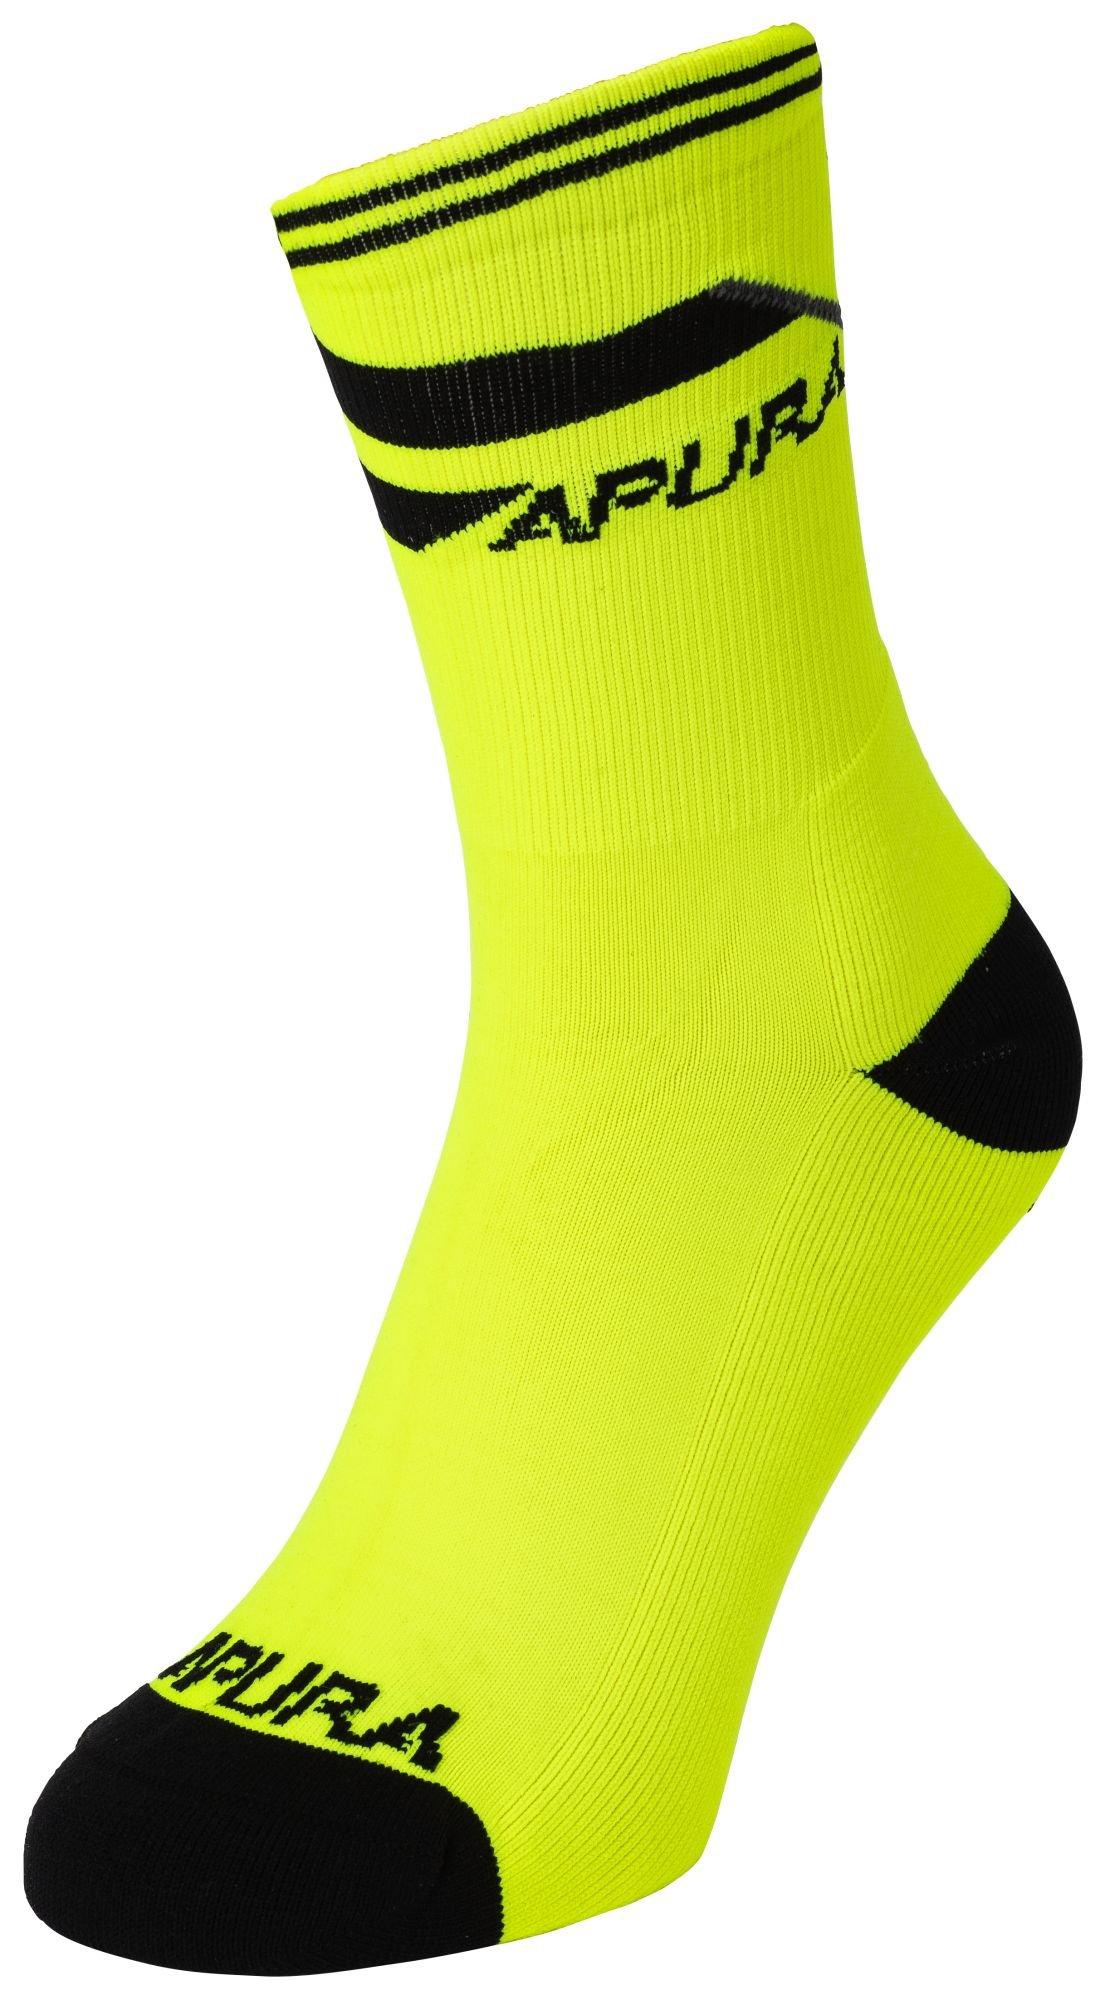 socken winter/Socken: Apura  DamenHerren Socke Stripe 36-38